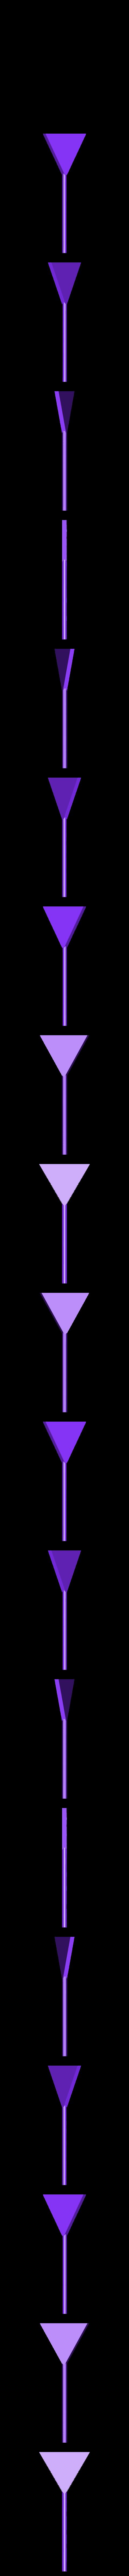 traffic-sign_triangle_upside.stl Download free STL file Traffic Sign Models • 3D print model, Saran